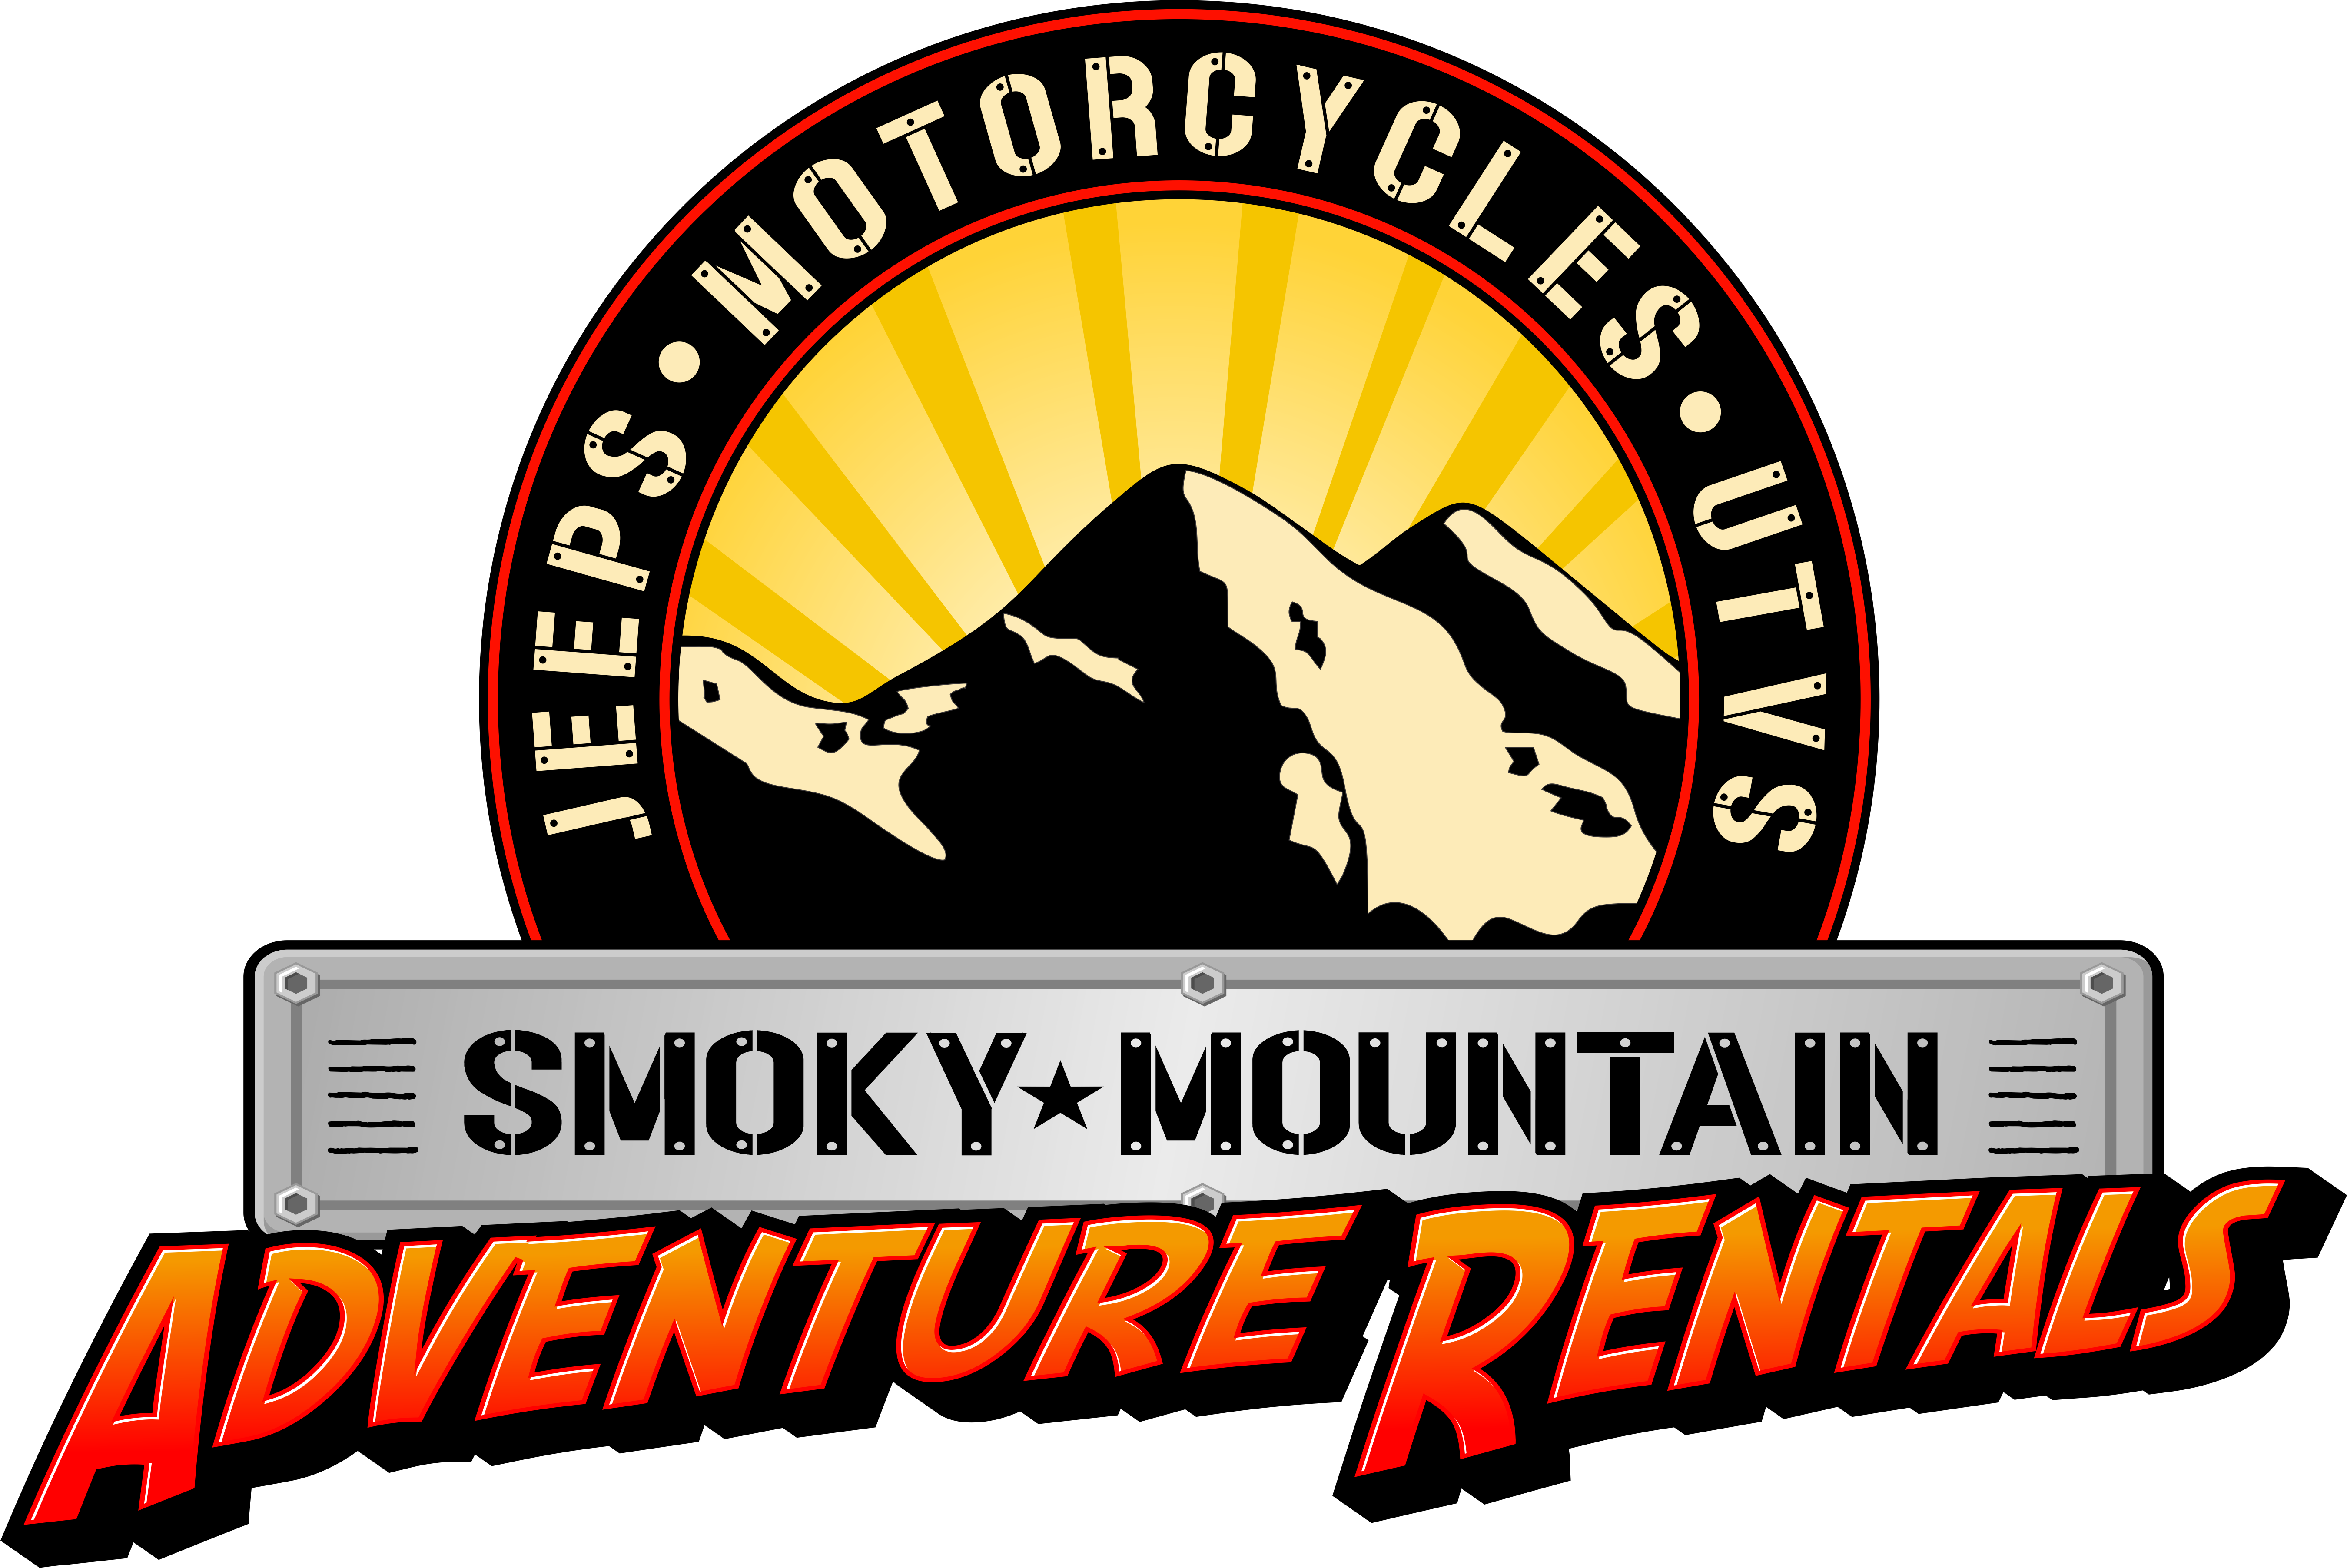 SMOKY MOUNTAIN ADVENTURE RENTALS LOGO 2.